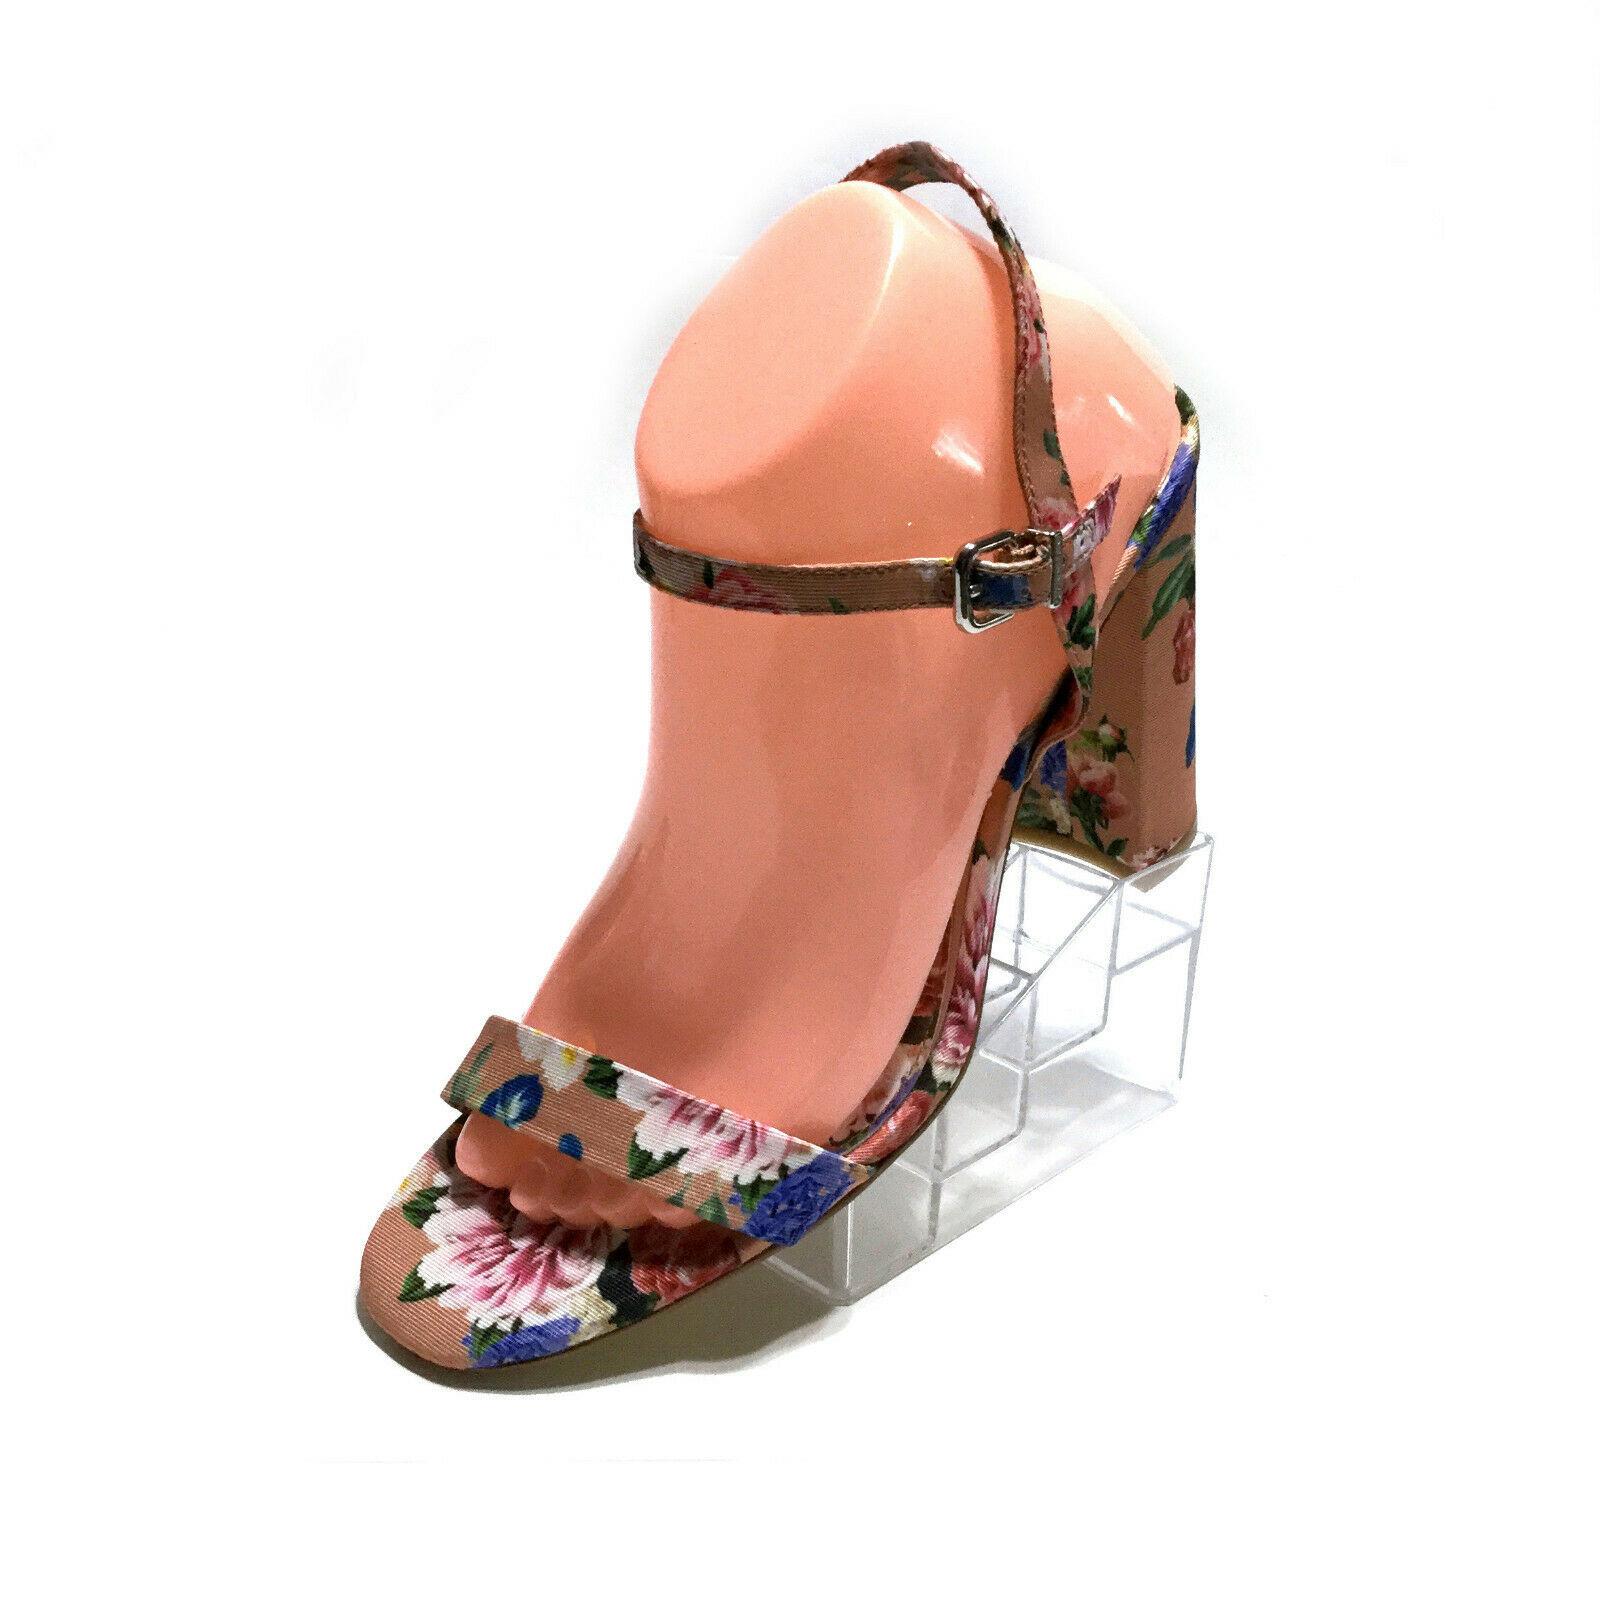 Gianni Bini McKaria Floral Print Block Heel Dress Sandals Size 9  M - Worn Once - $23.74